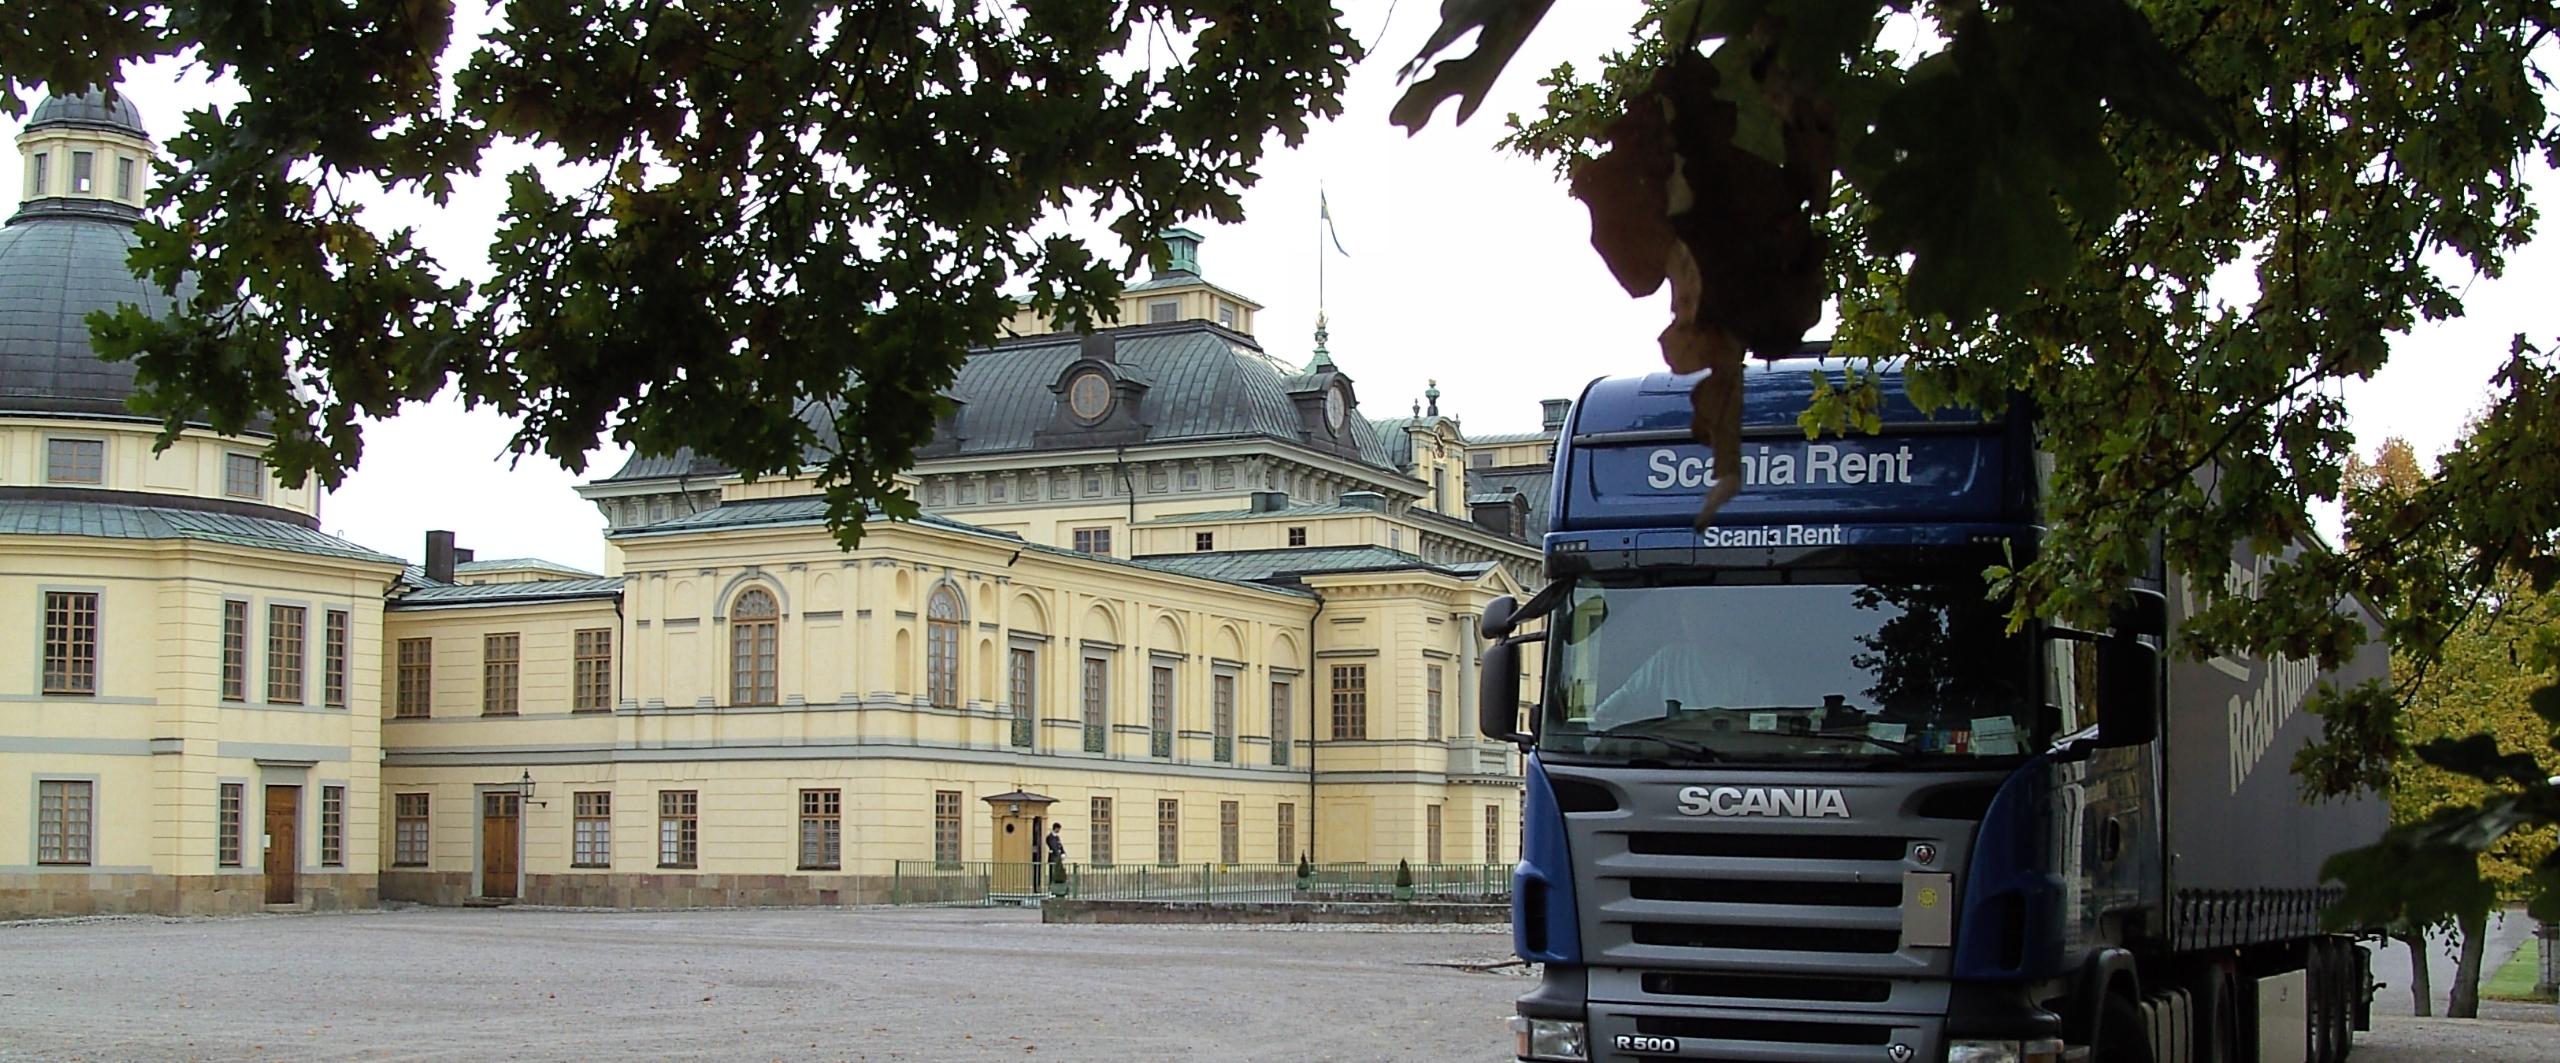 Schloss Drotningholm beschnitten Stockholm